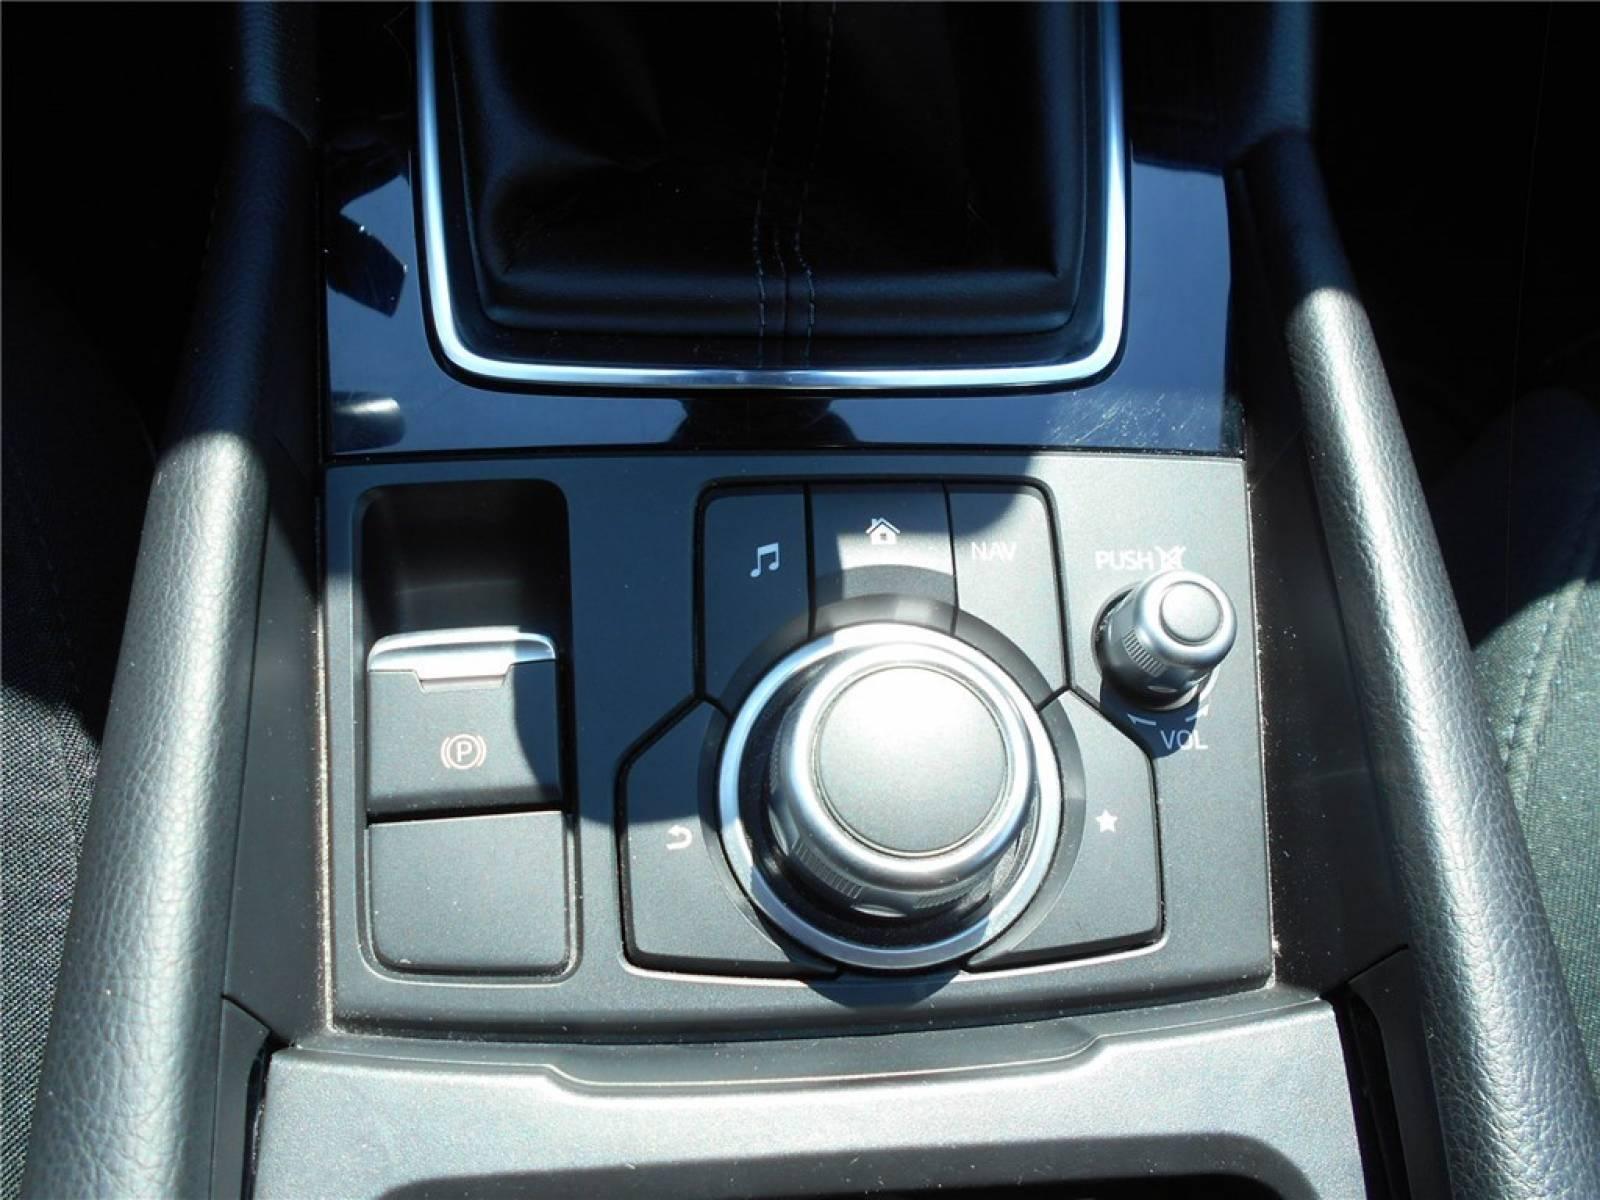 MAZDA Mazda3 2.2L SKYACTIV-D 150ch - véhicule d'occasion - Groupe Guillet - Chalon Automobiles - 71100 - Chalon-sur-Saône - 22